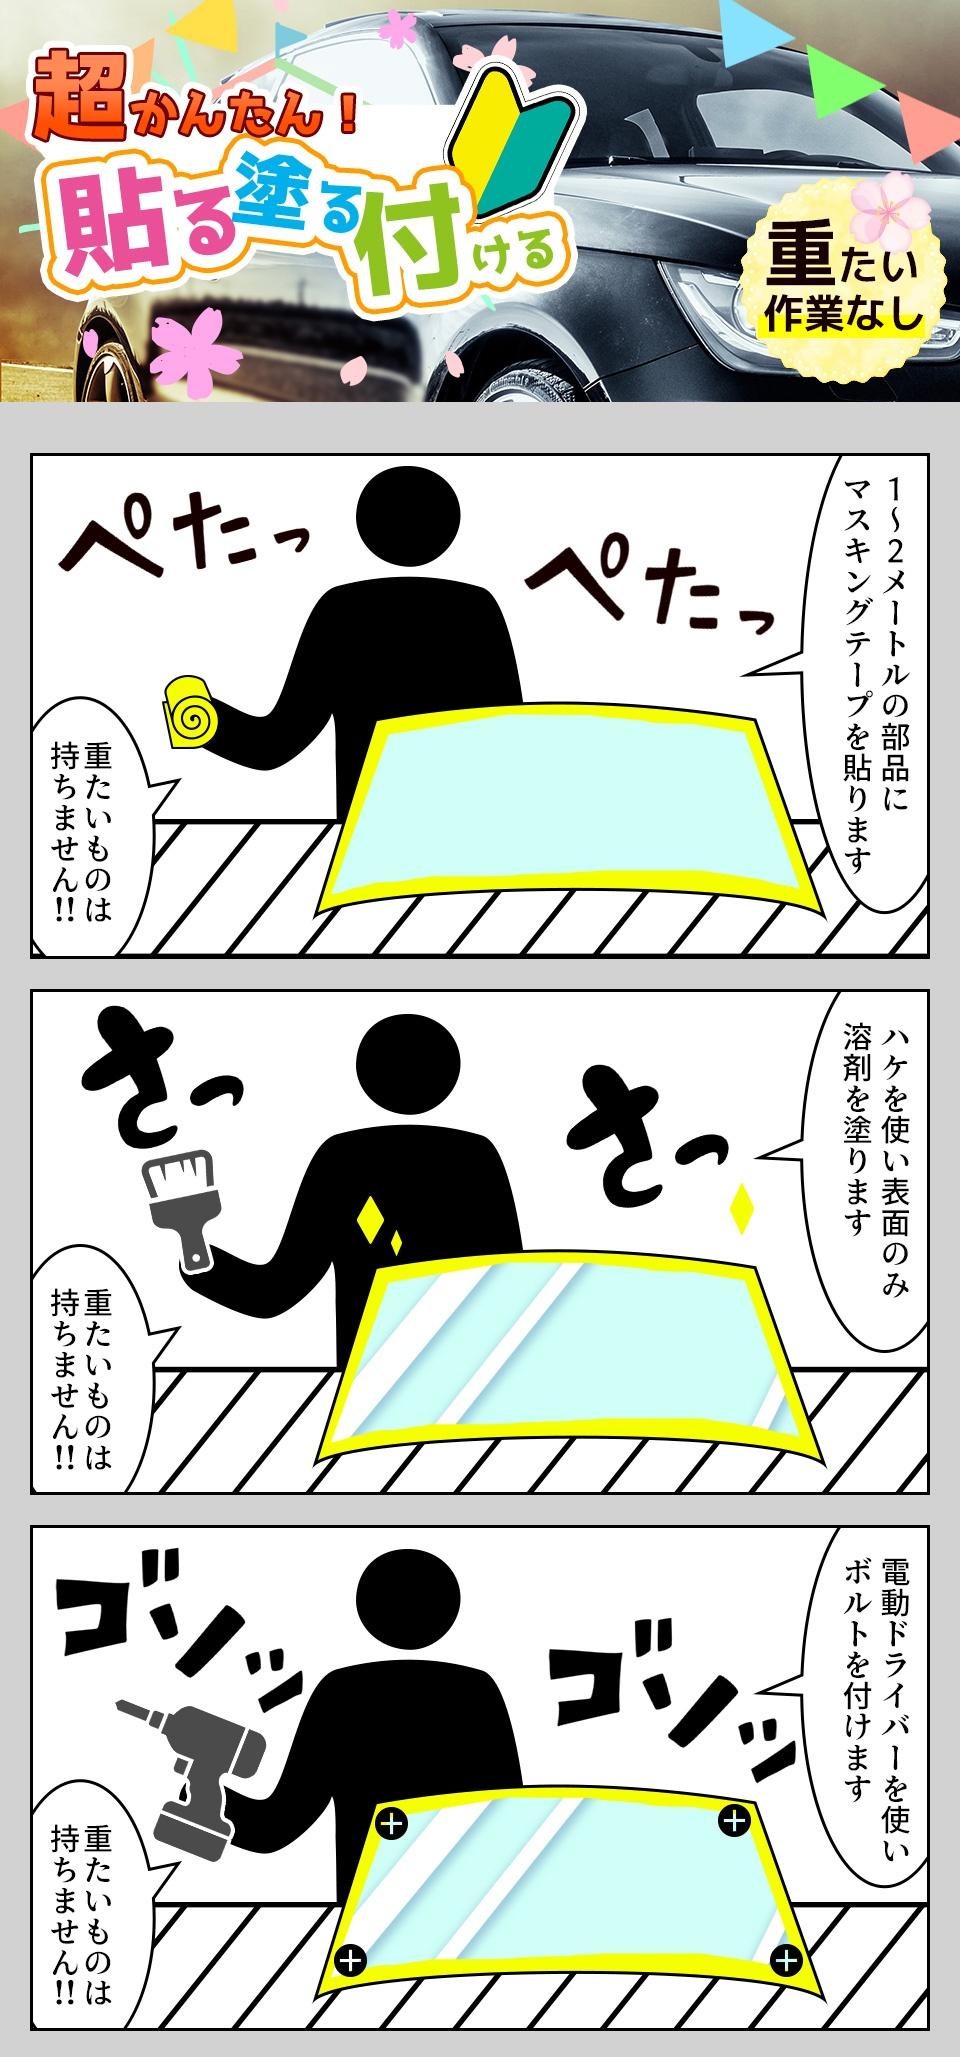 部品の組付け・軽作業 愛知県豊田市の派遣社員求人